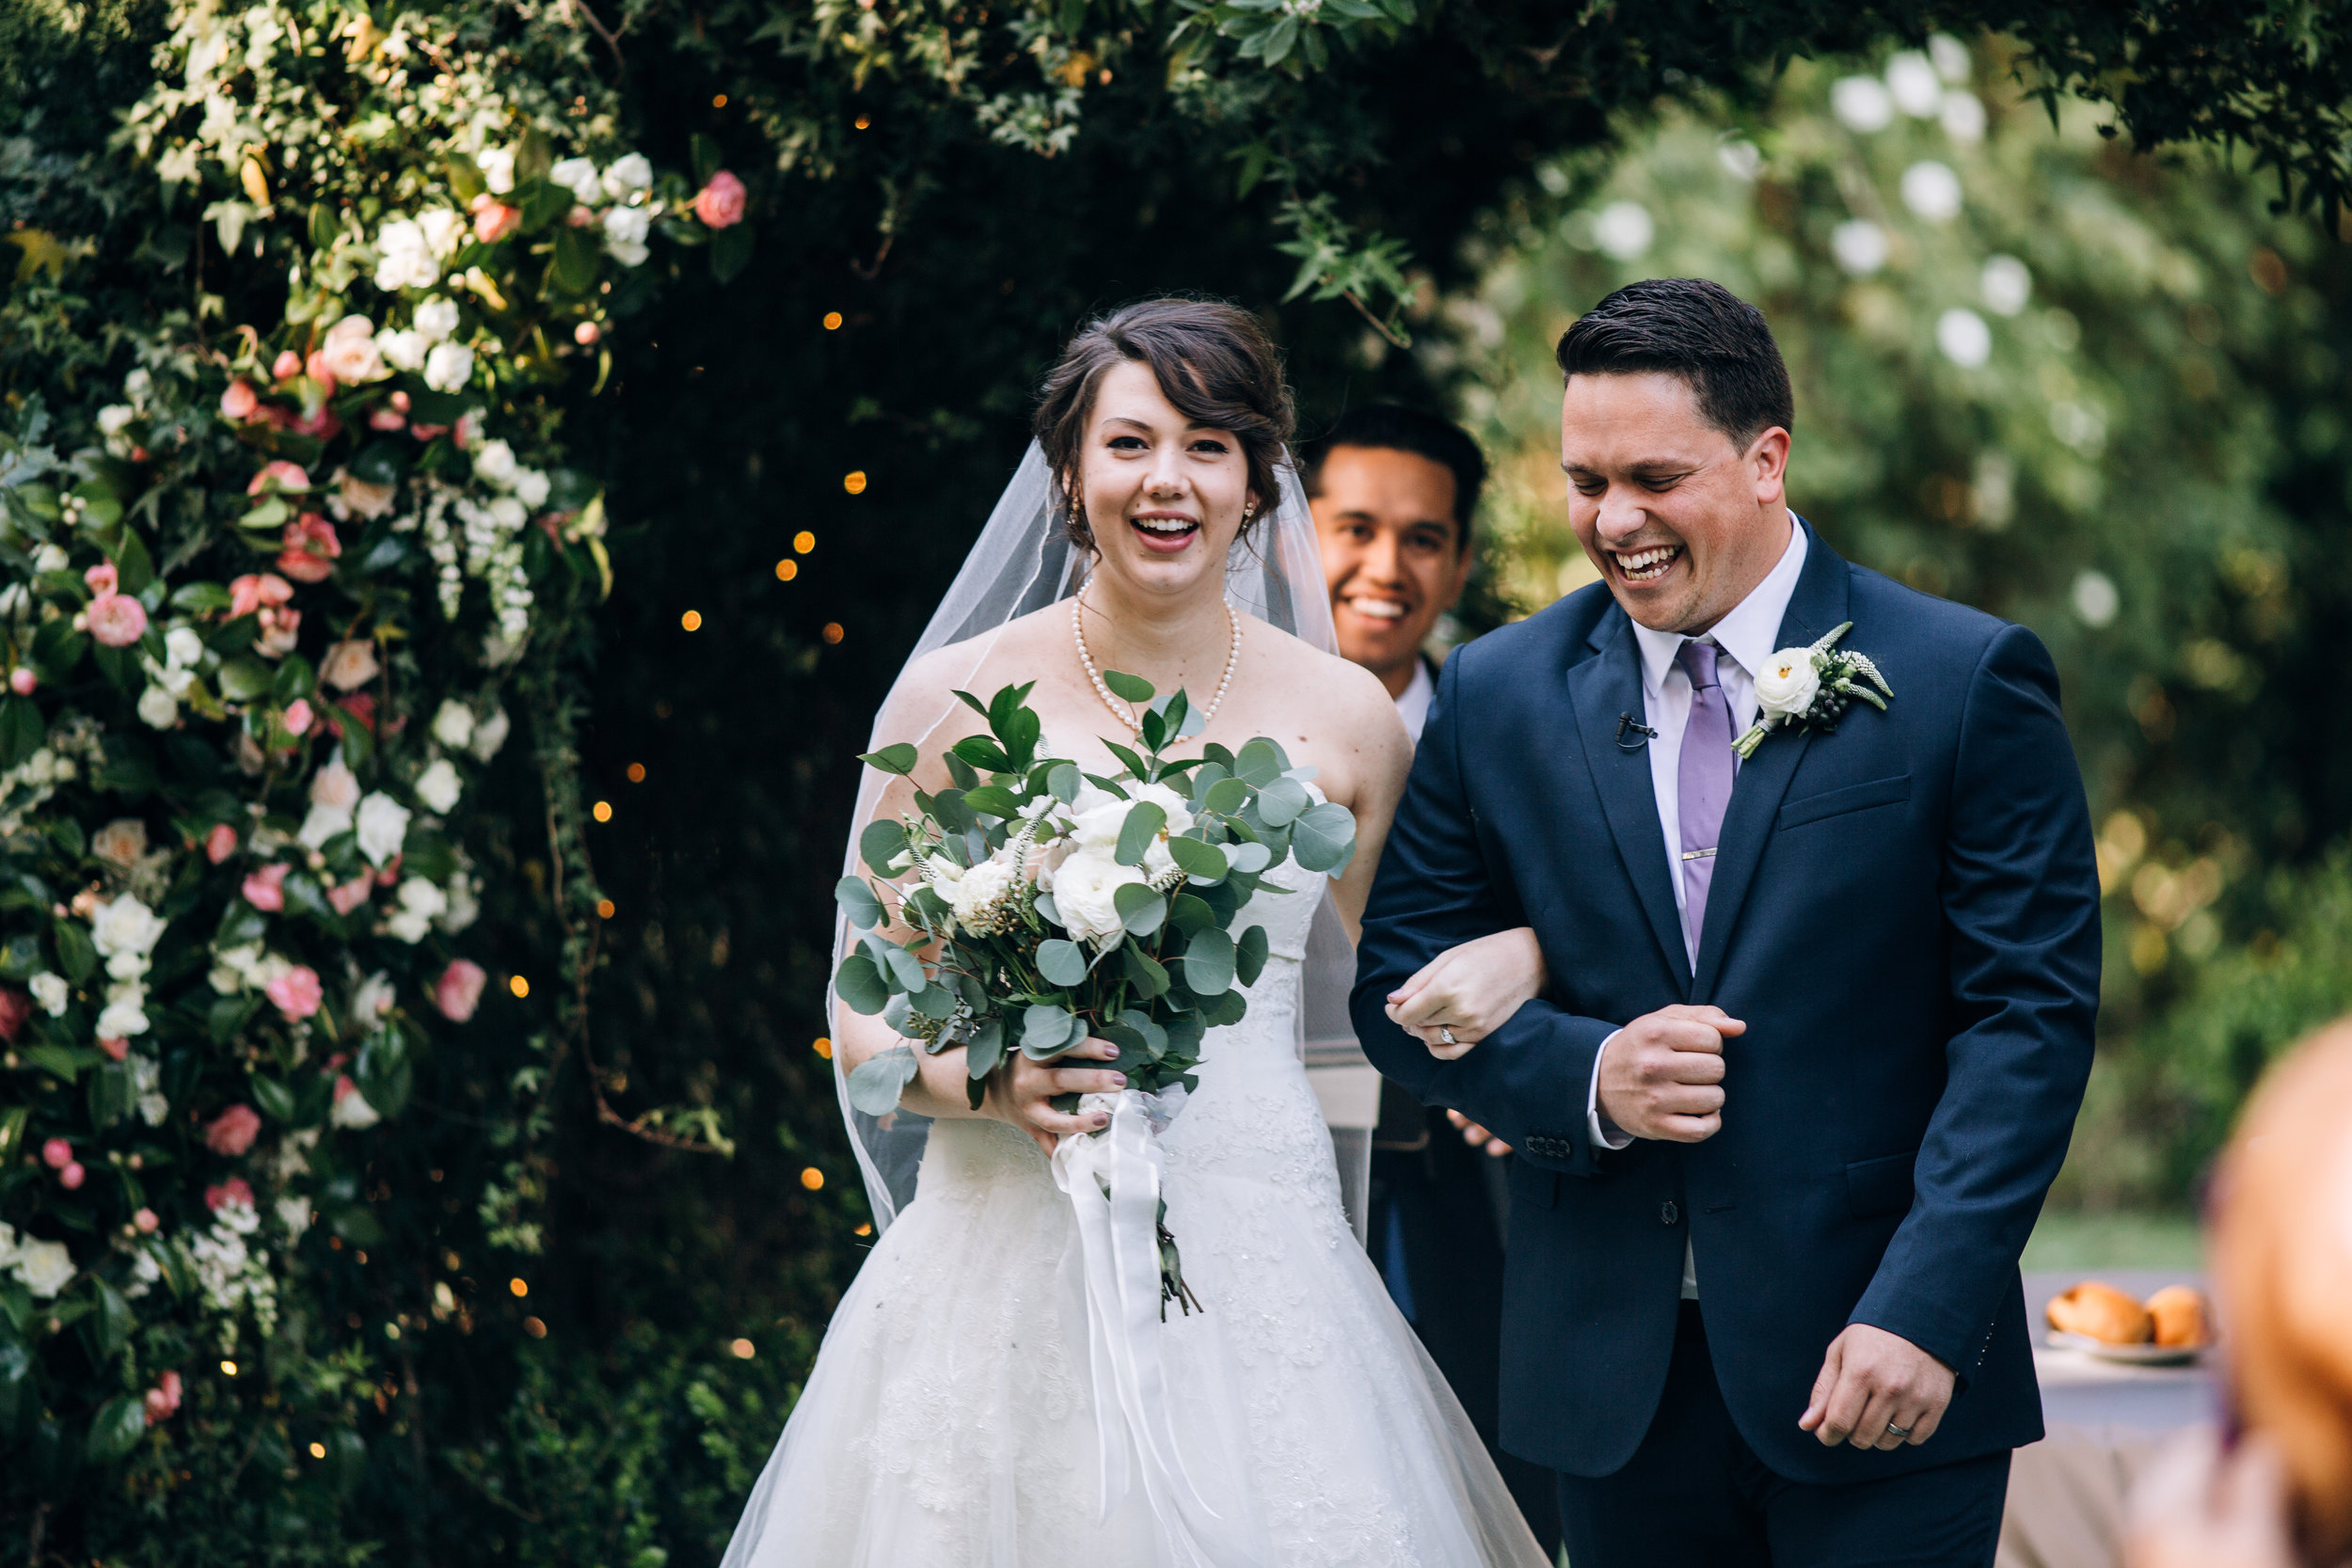 KaraNixonWeddings-SanMarcos-Wedding-ceremonyend.jpg